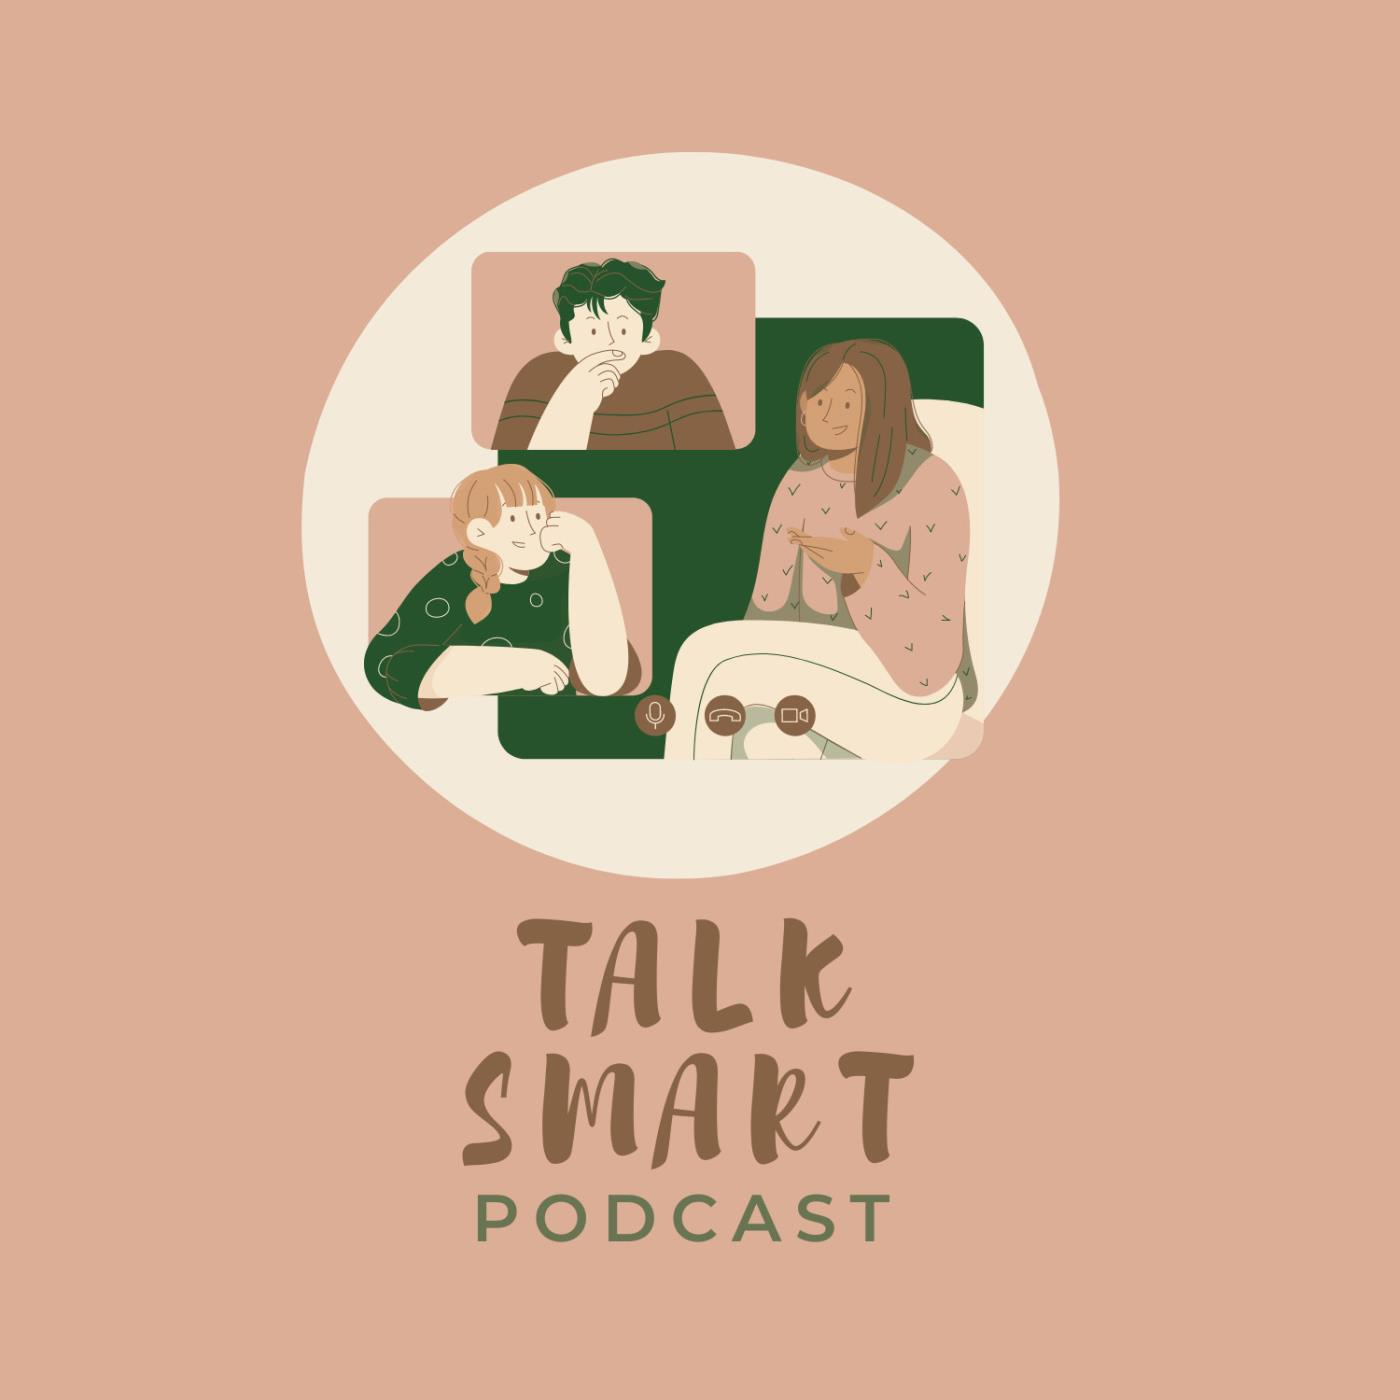 Talk Smart Podcast